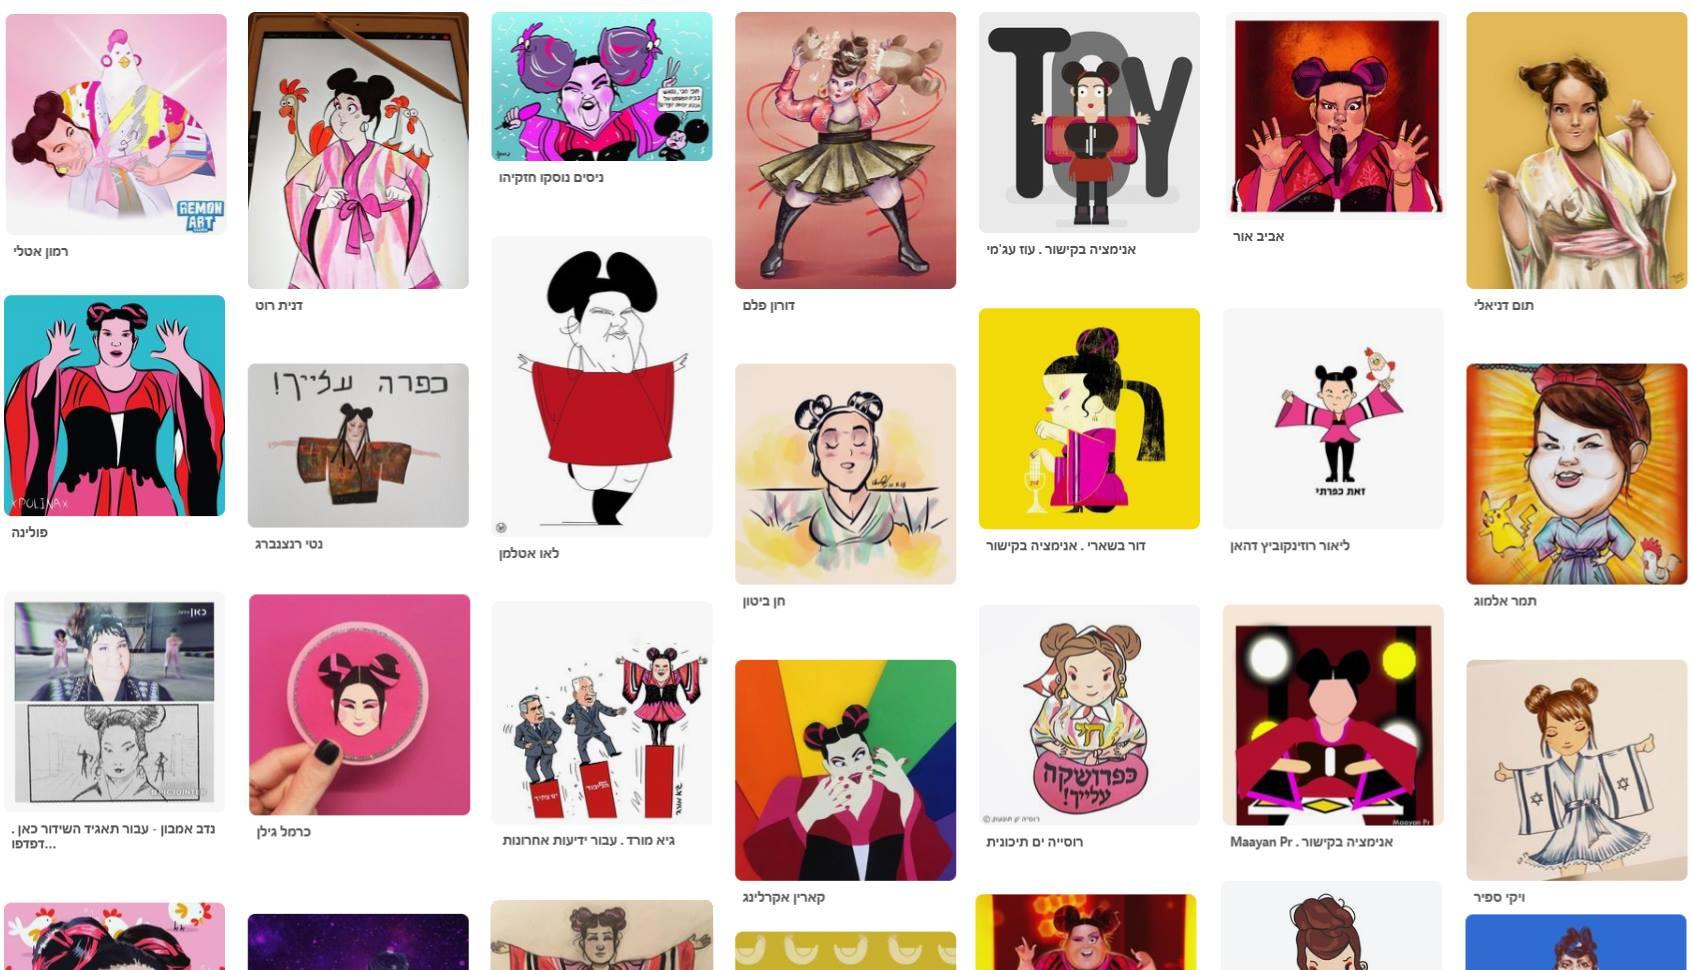 Netta Barzilai illustrations by the Israeli Illustration forum on fb